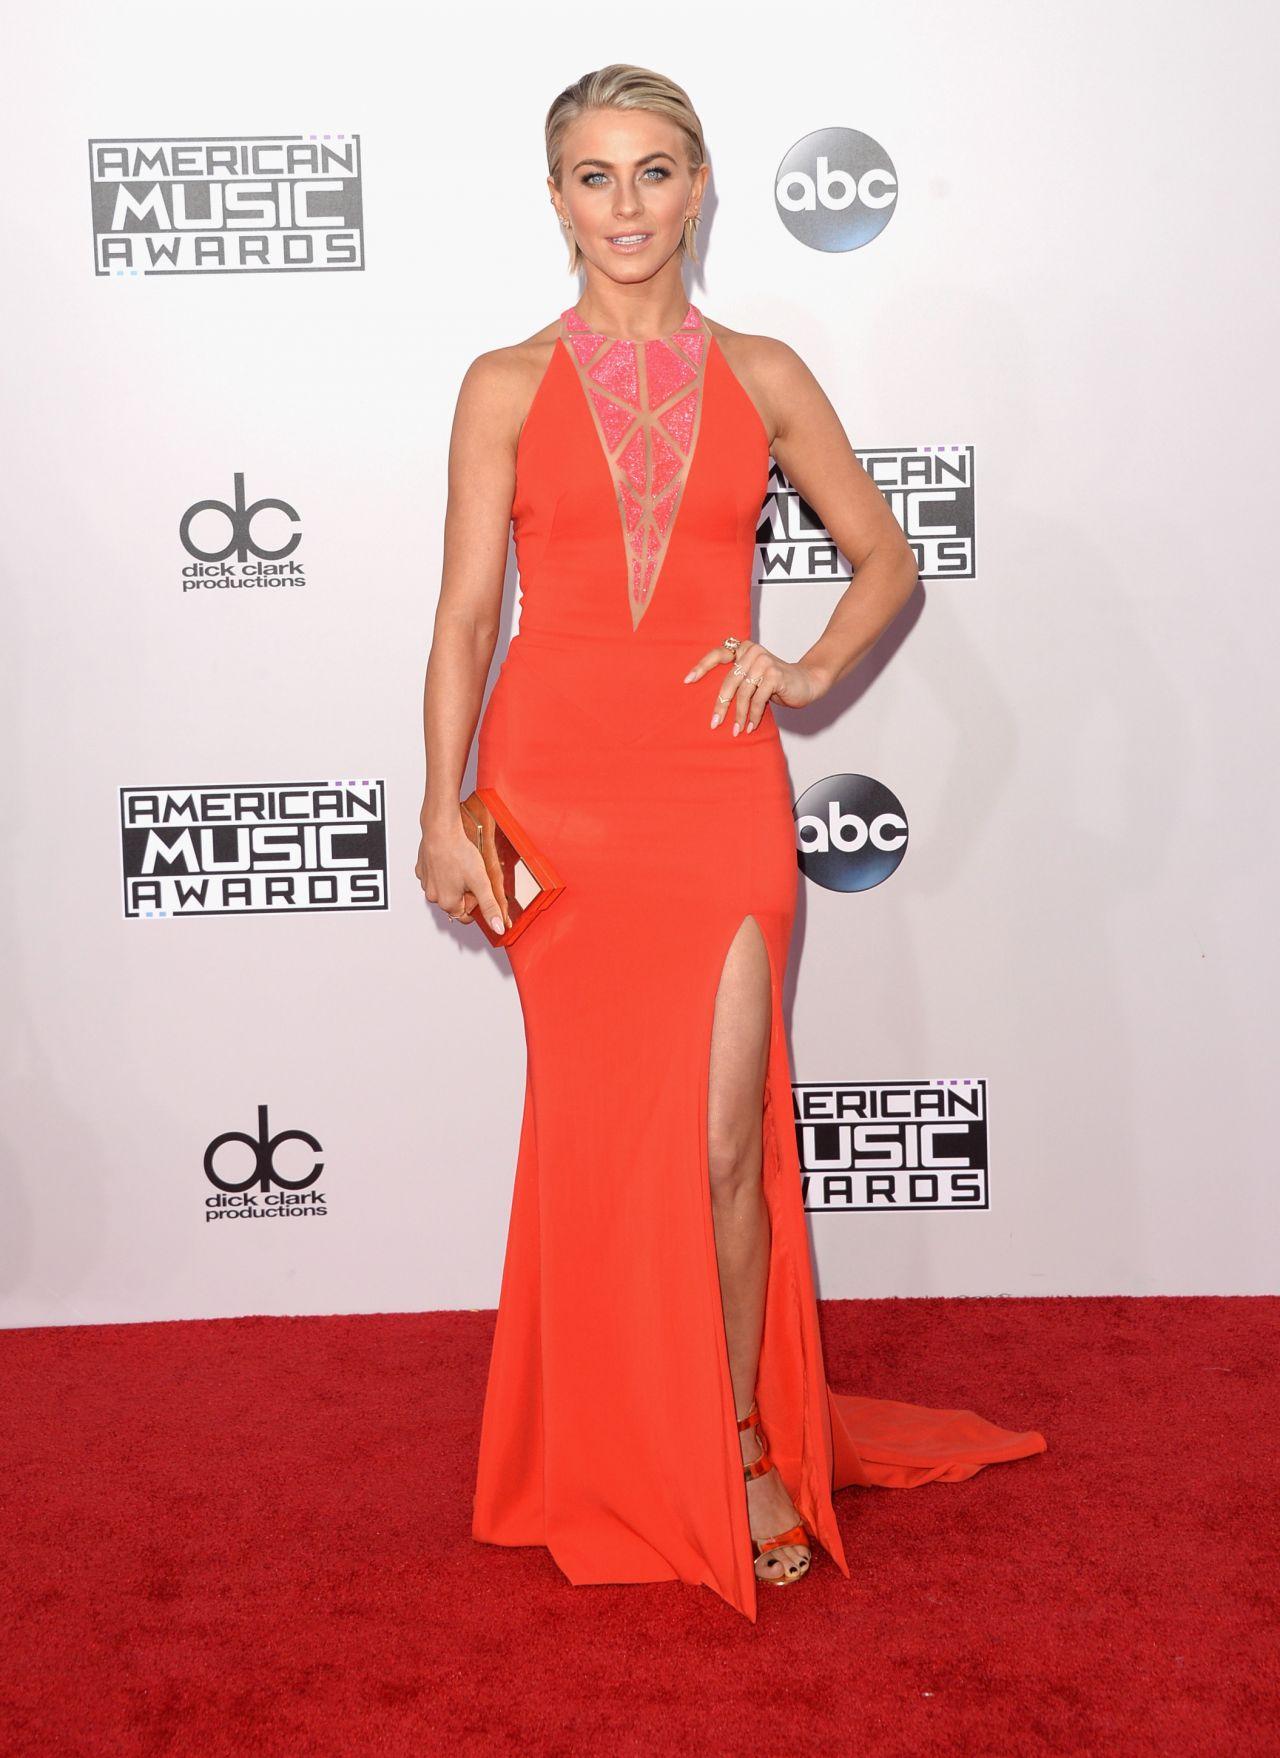 julianne hough on red carpet 2014 american music awards